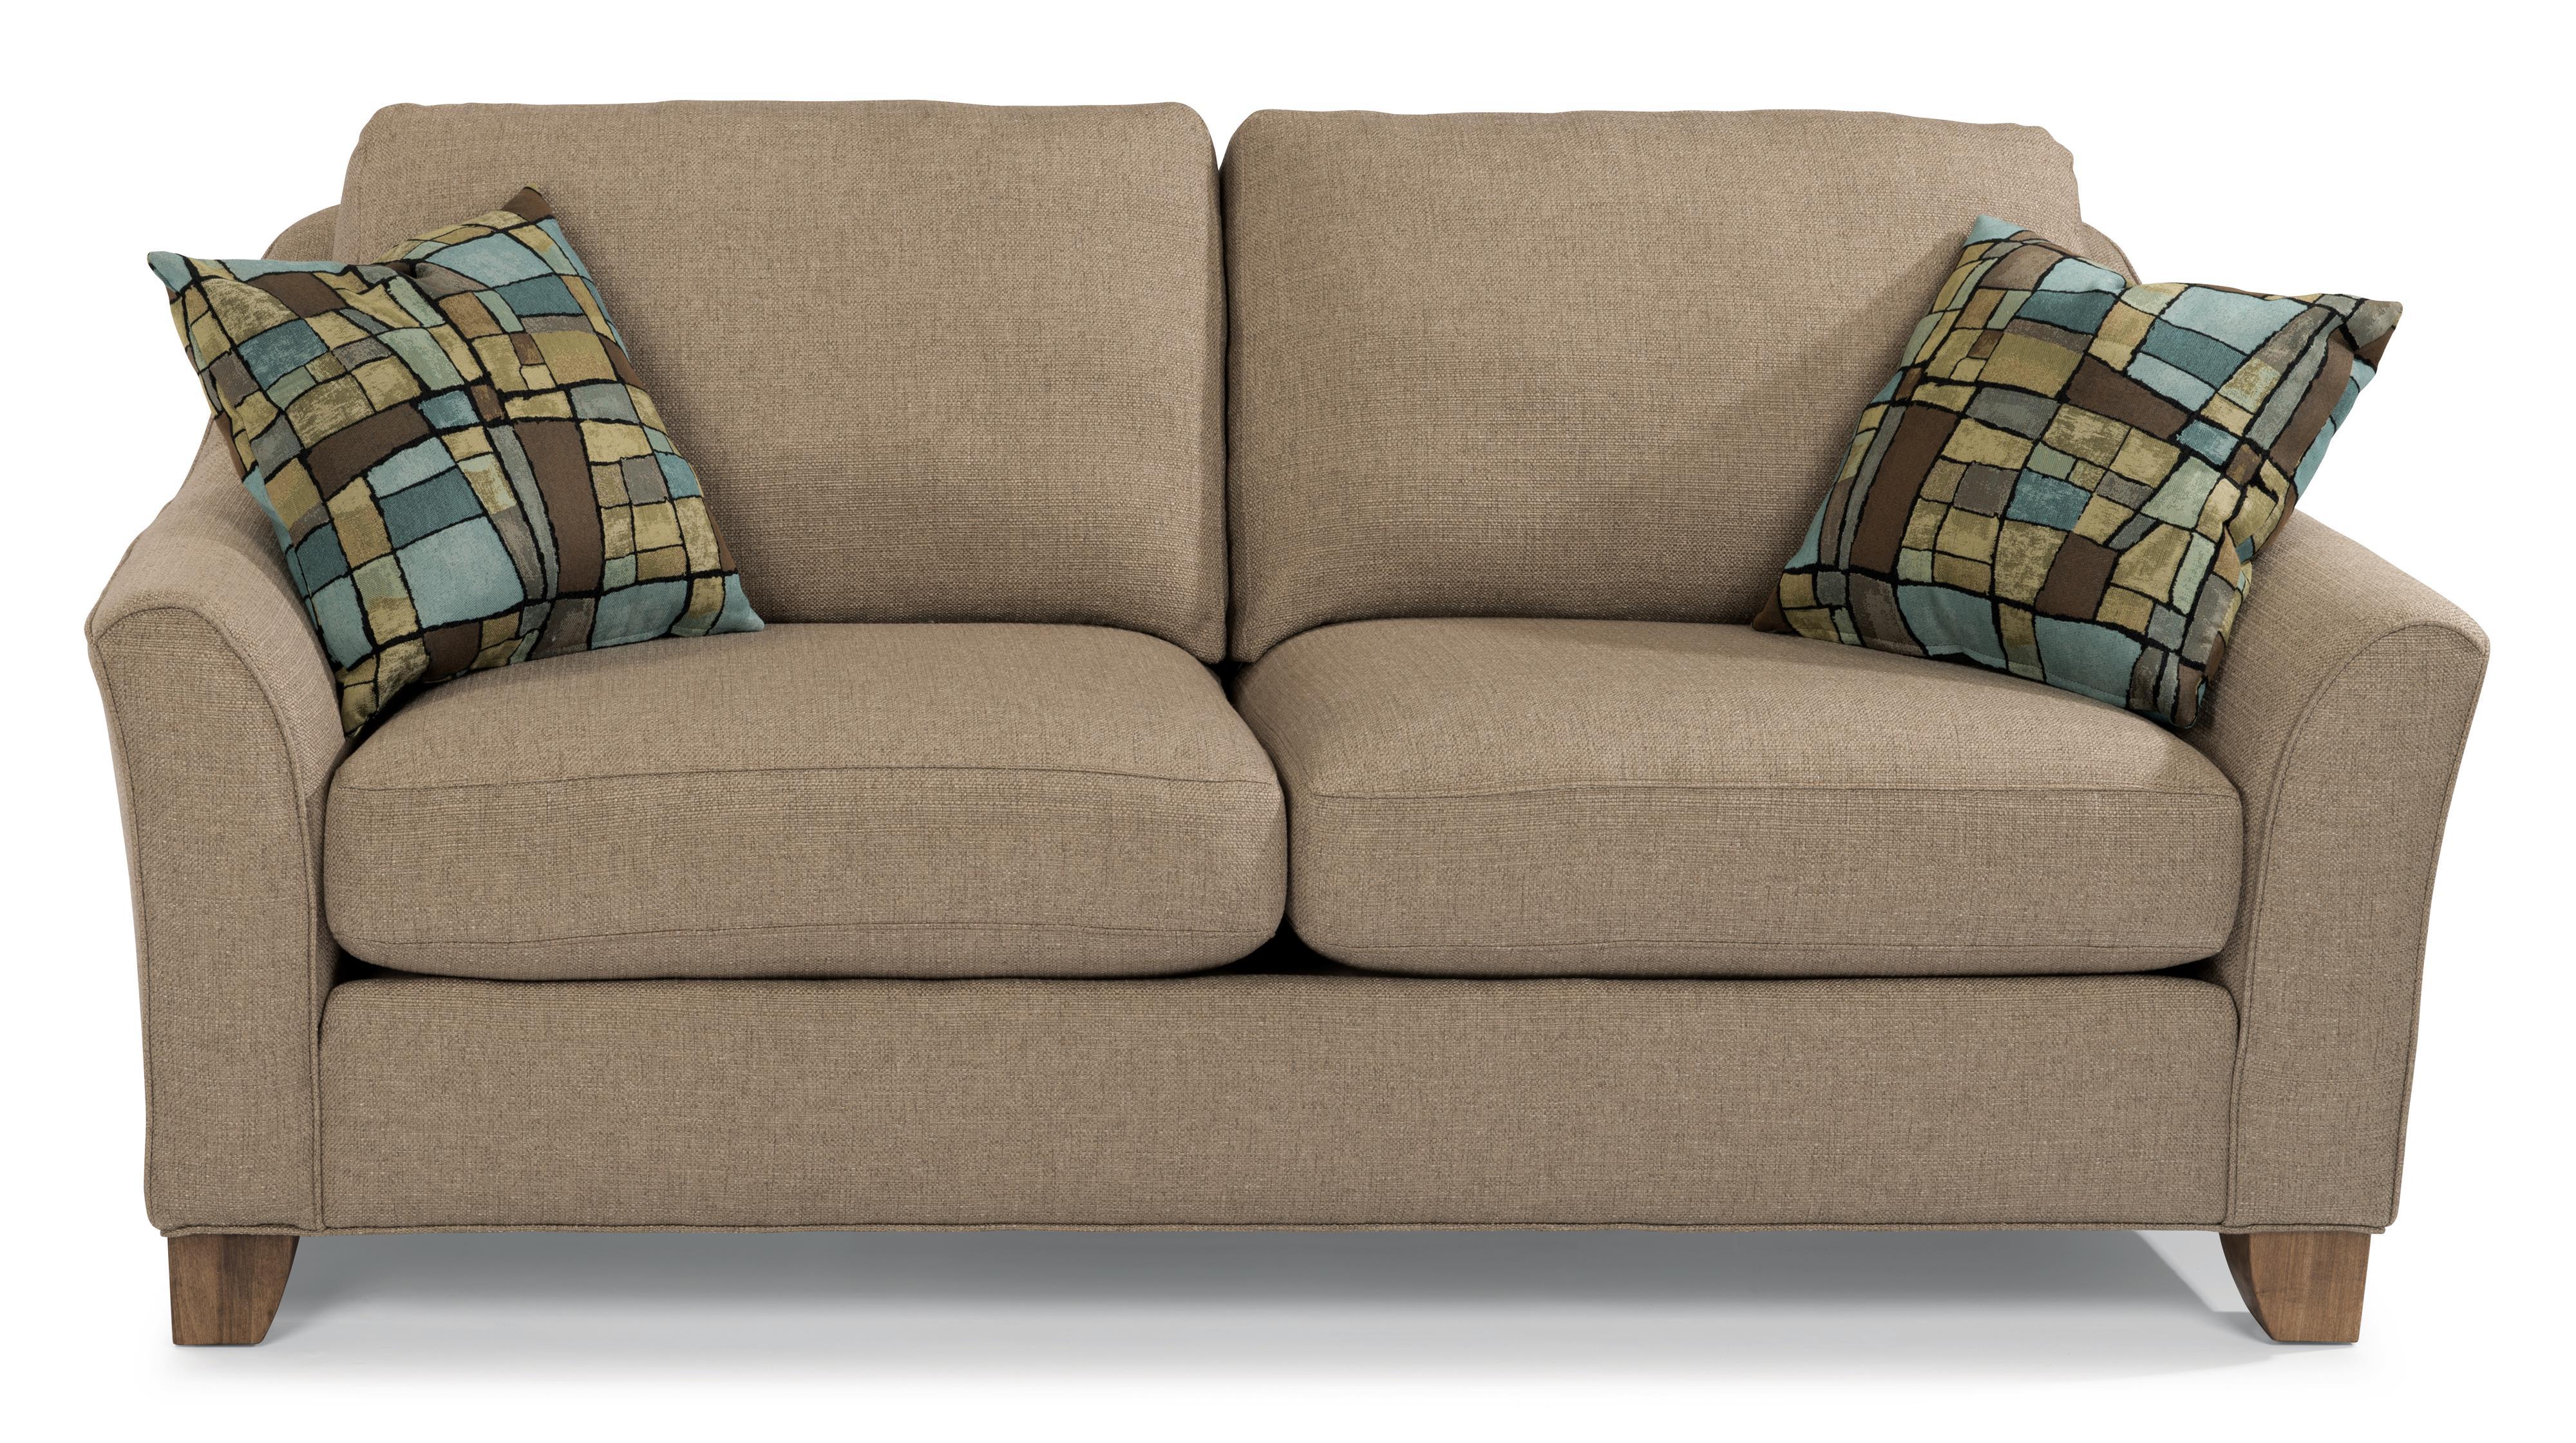 Flex Steel Sofa Flexsteel Sofa With Pillows 657955 Talsma Furniture Thesofa